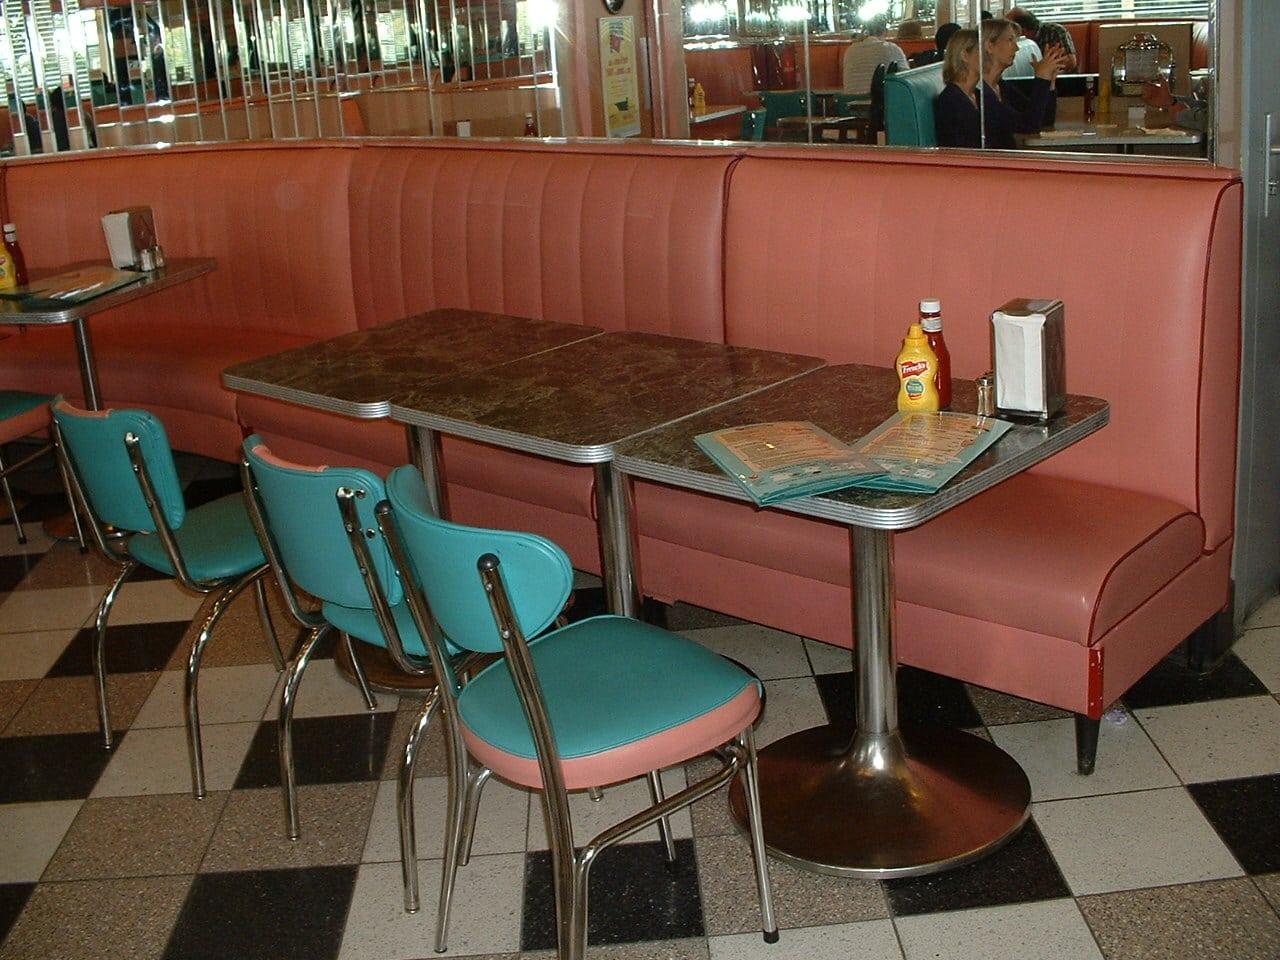 Anette's Diner